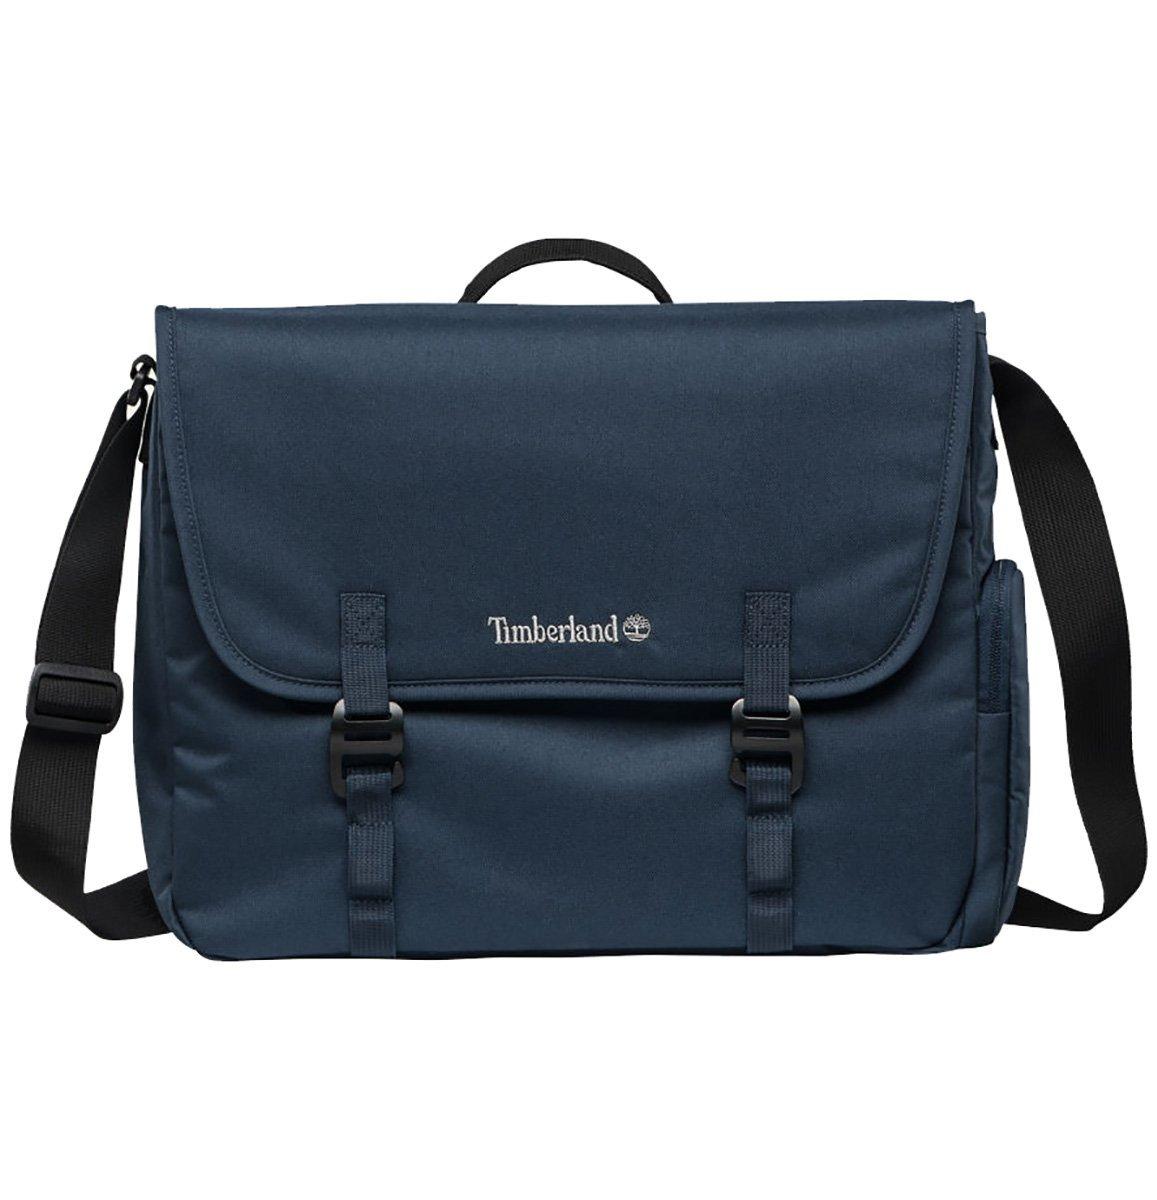 Timberland Unisex Crofton Water-Resistant Messenger Laptop Bag